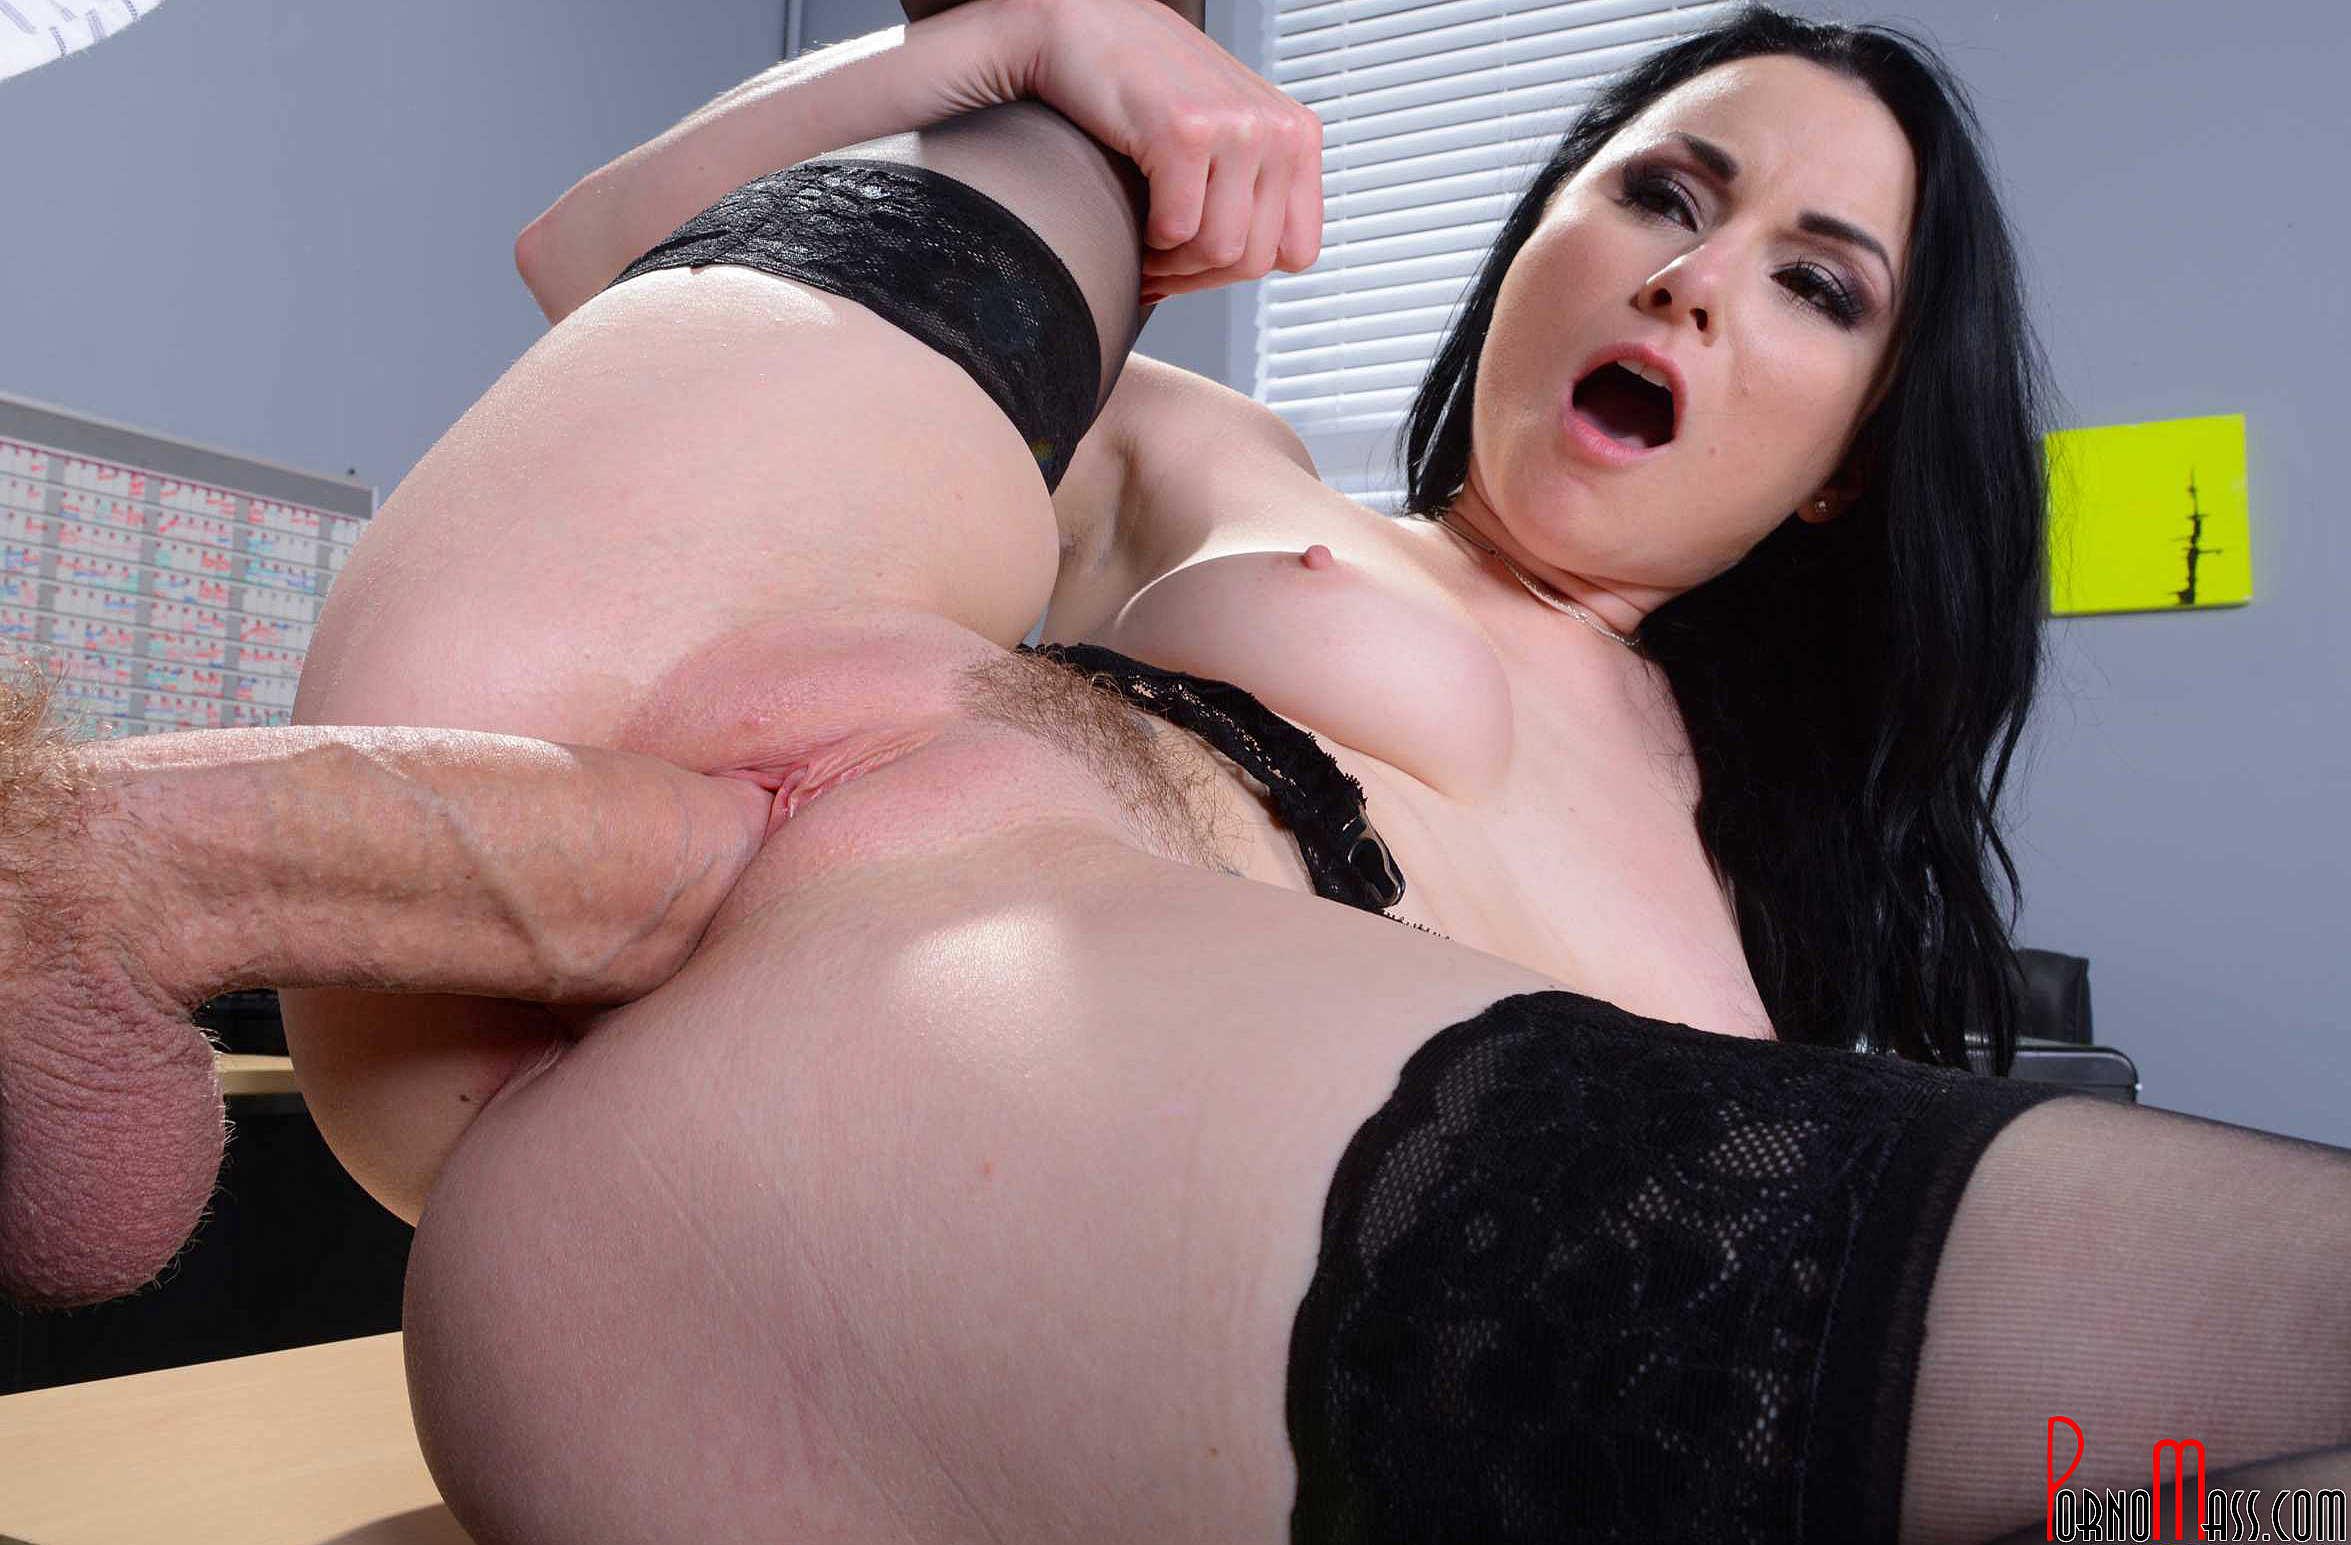 Секс между м и ж видео ролики фото 784-476